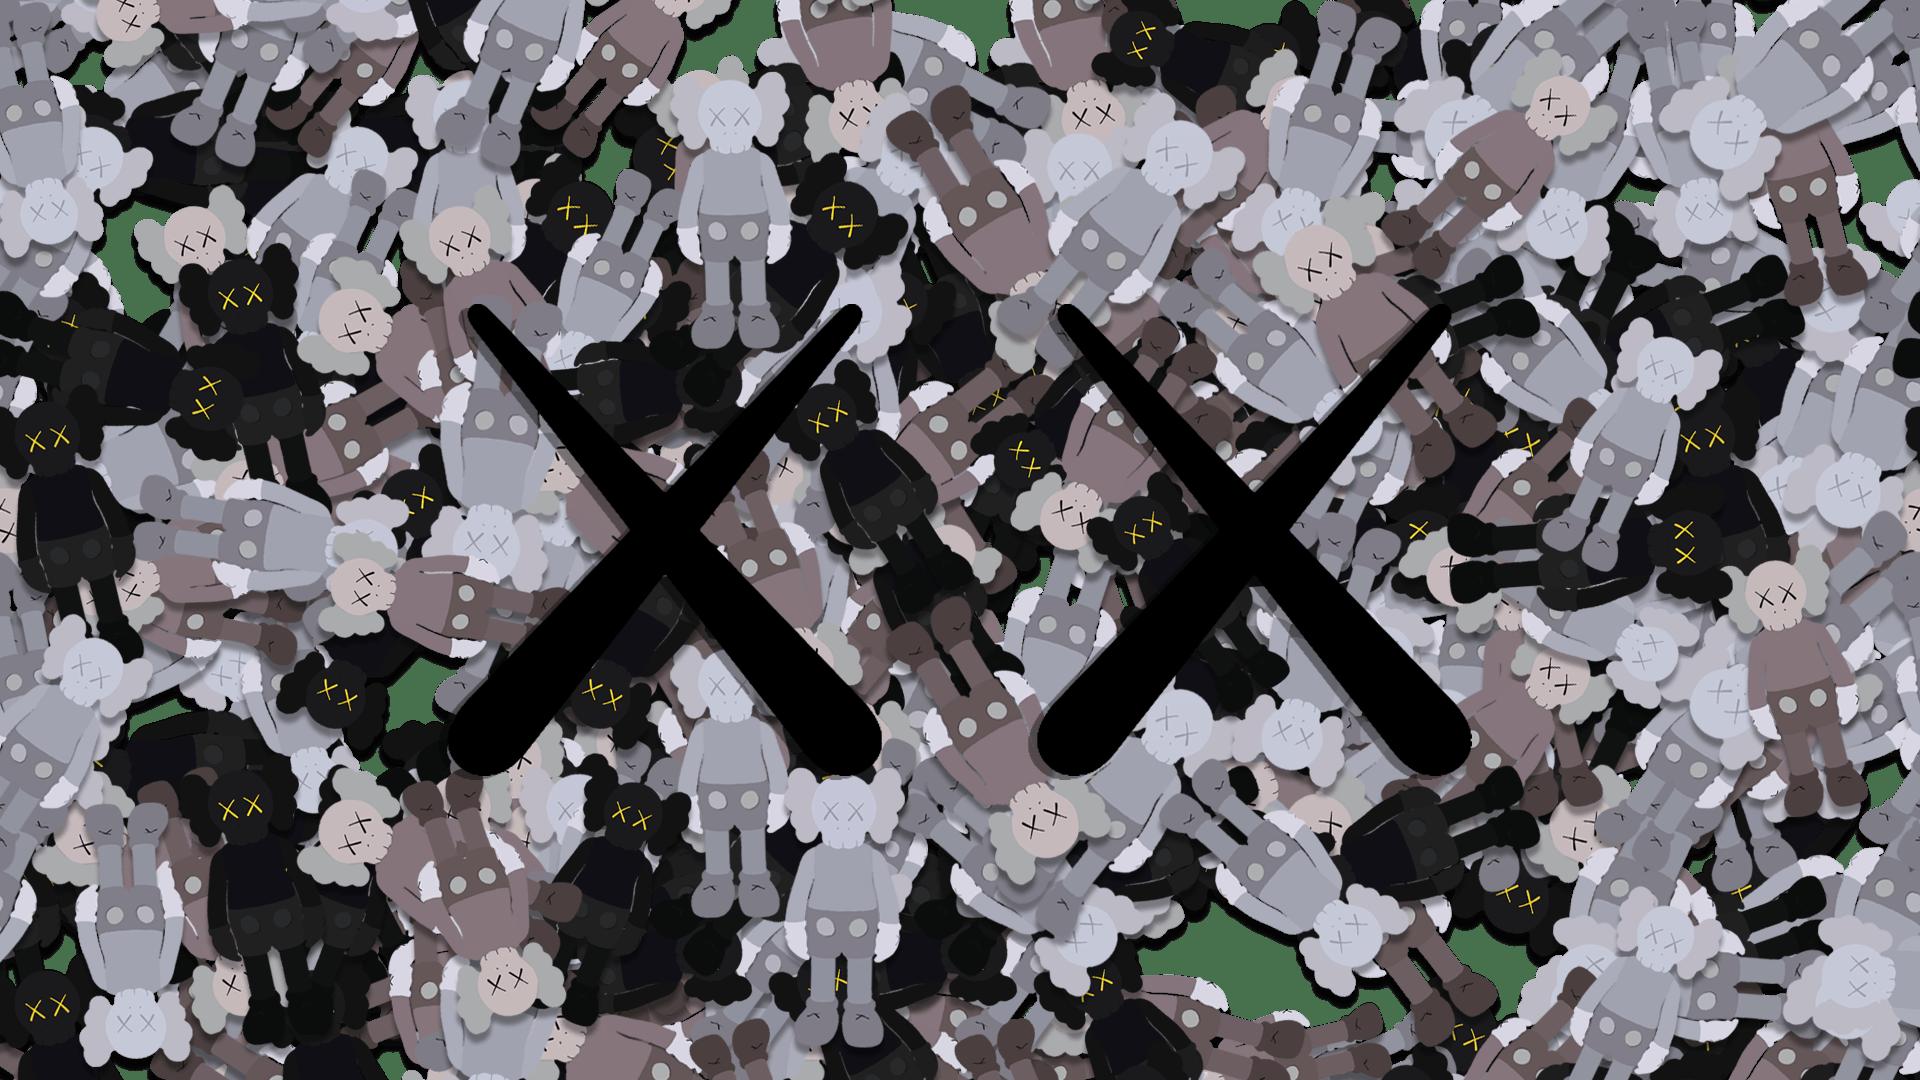 Bape Kaws Wallpapers Top Free Bape Kaws Backgrounds Wallpaperaccess